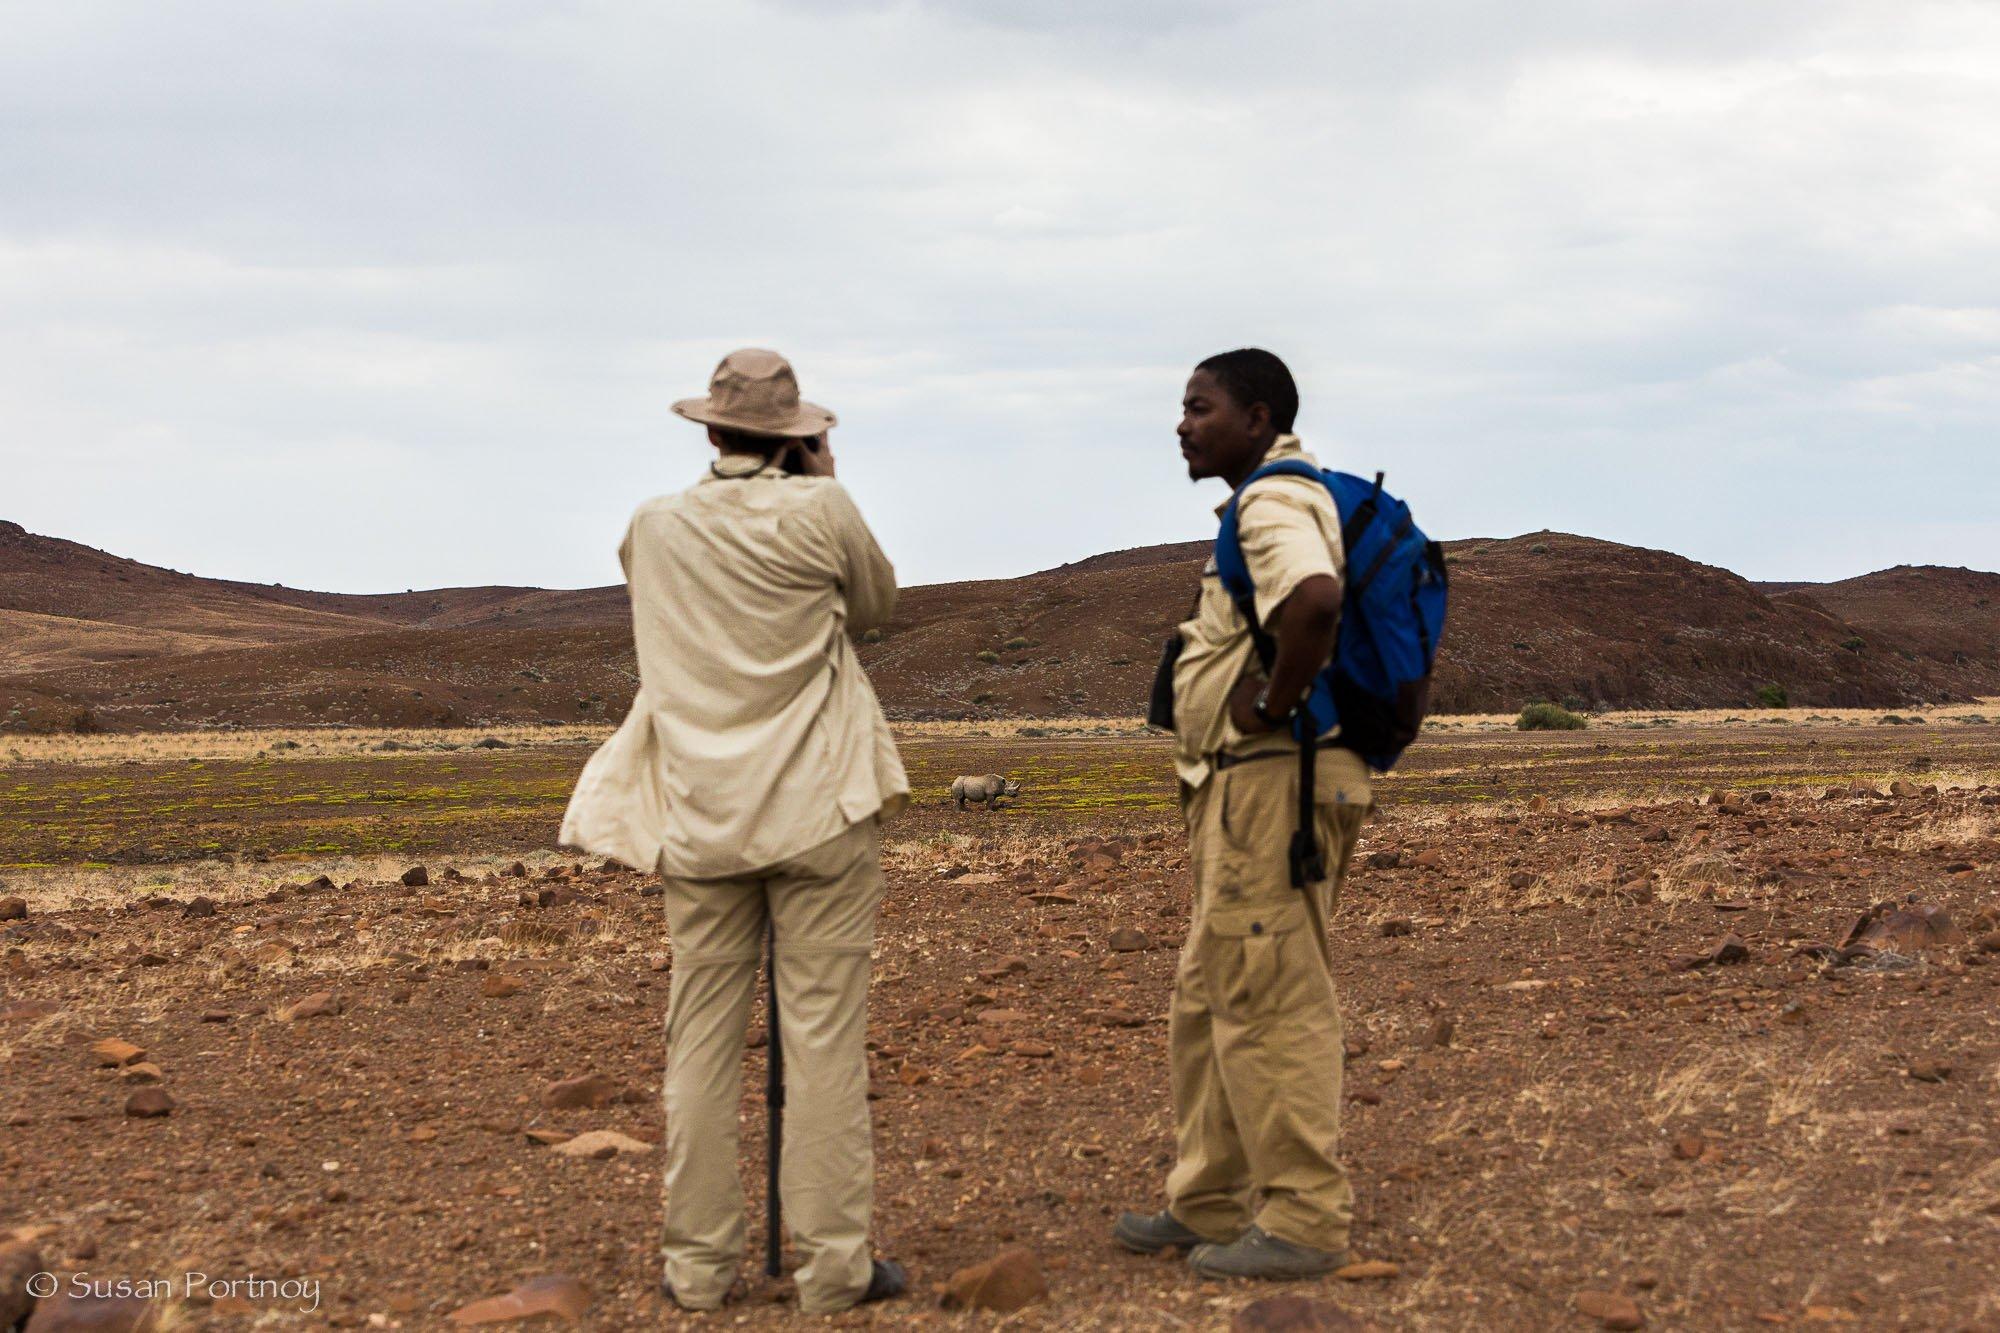 Susan Portnoy and Bons Roman photograph black rhino in Palmwag, Namibia